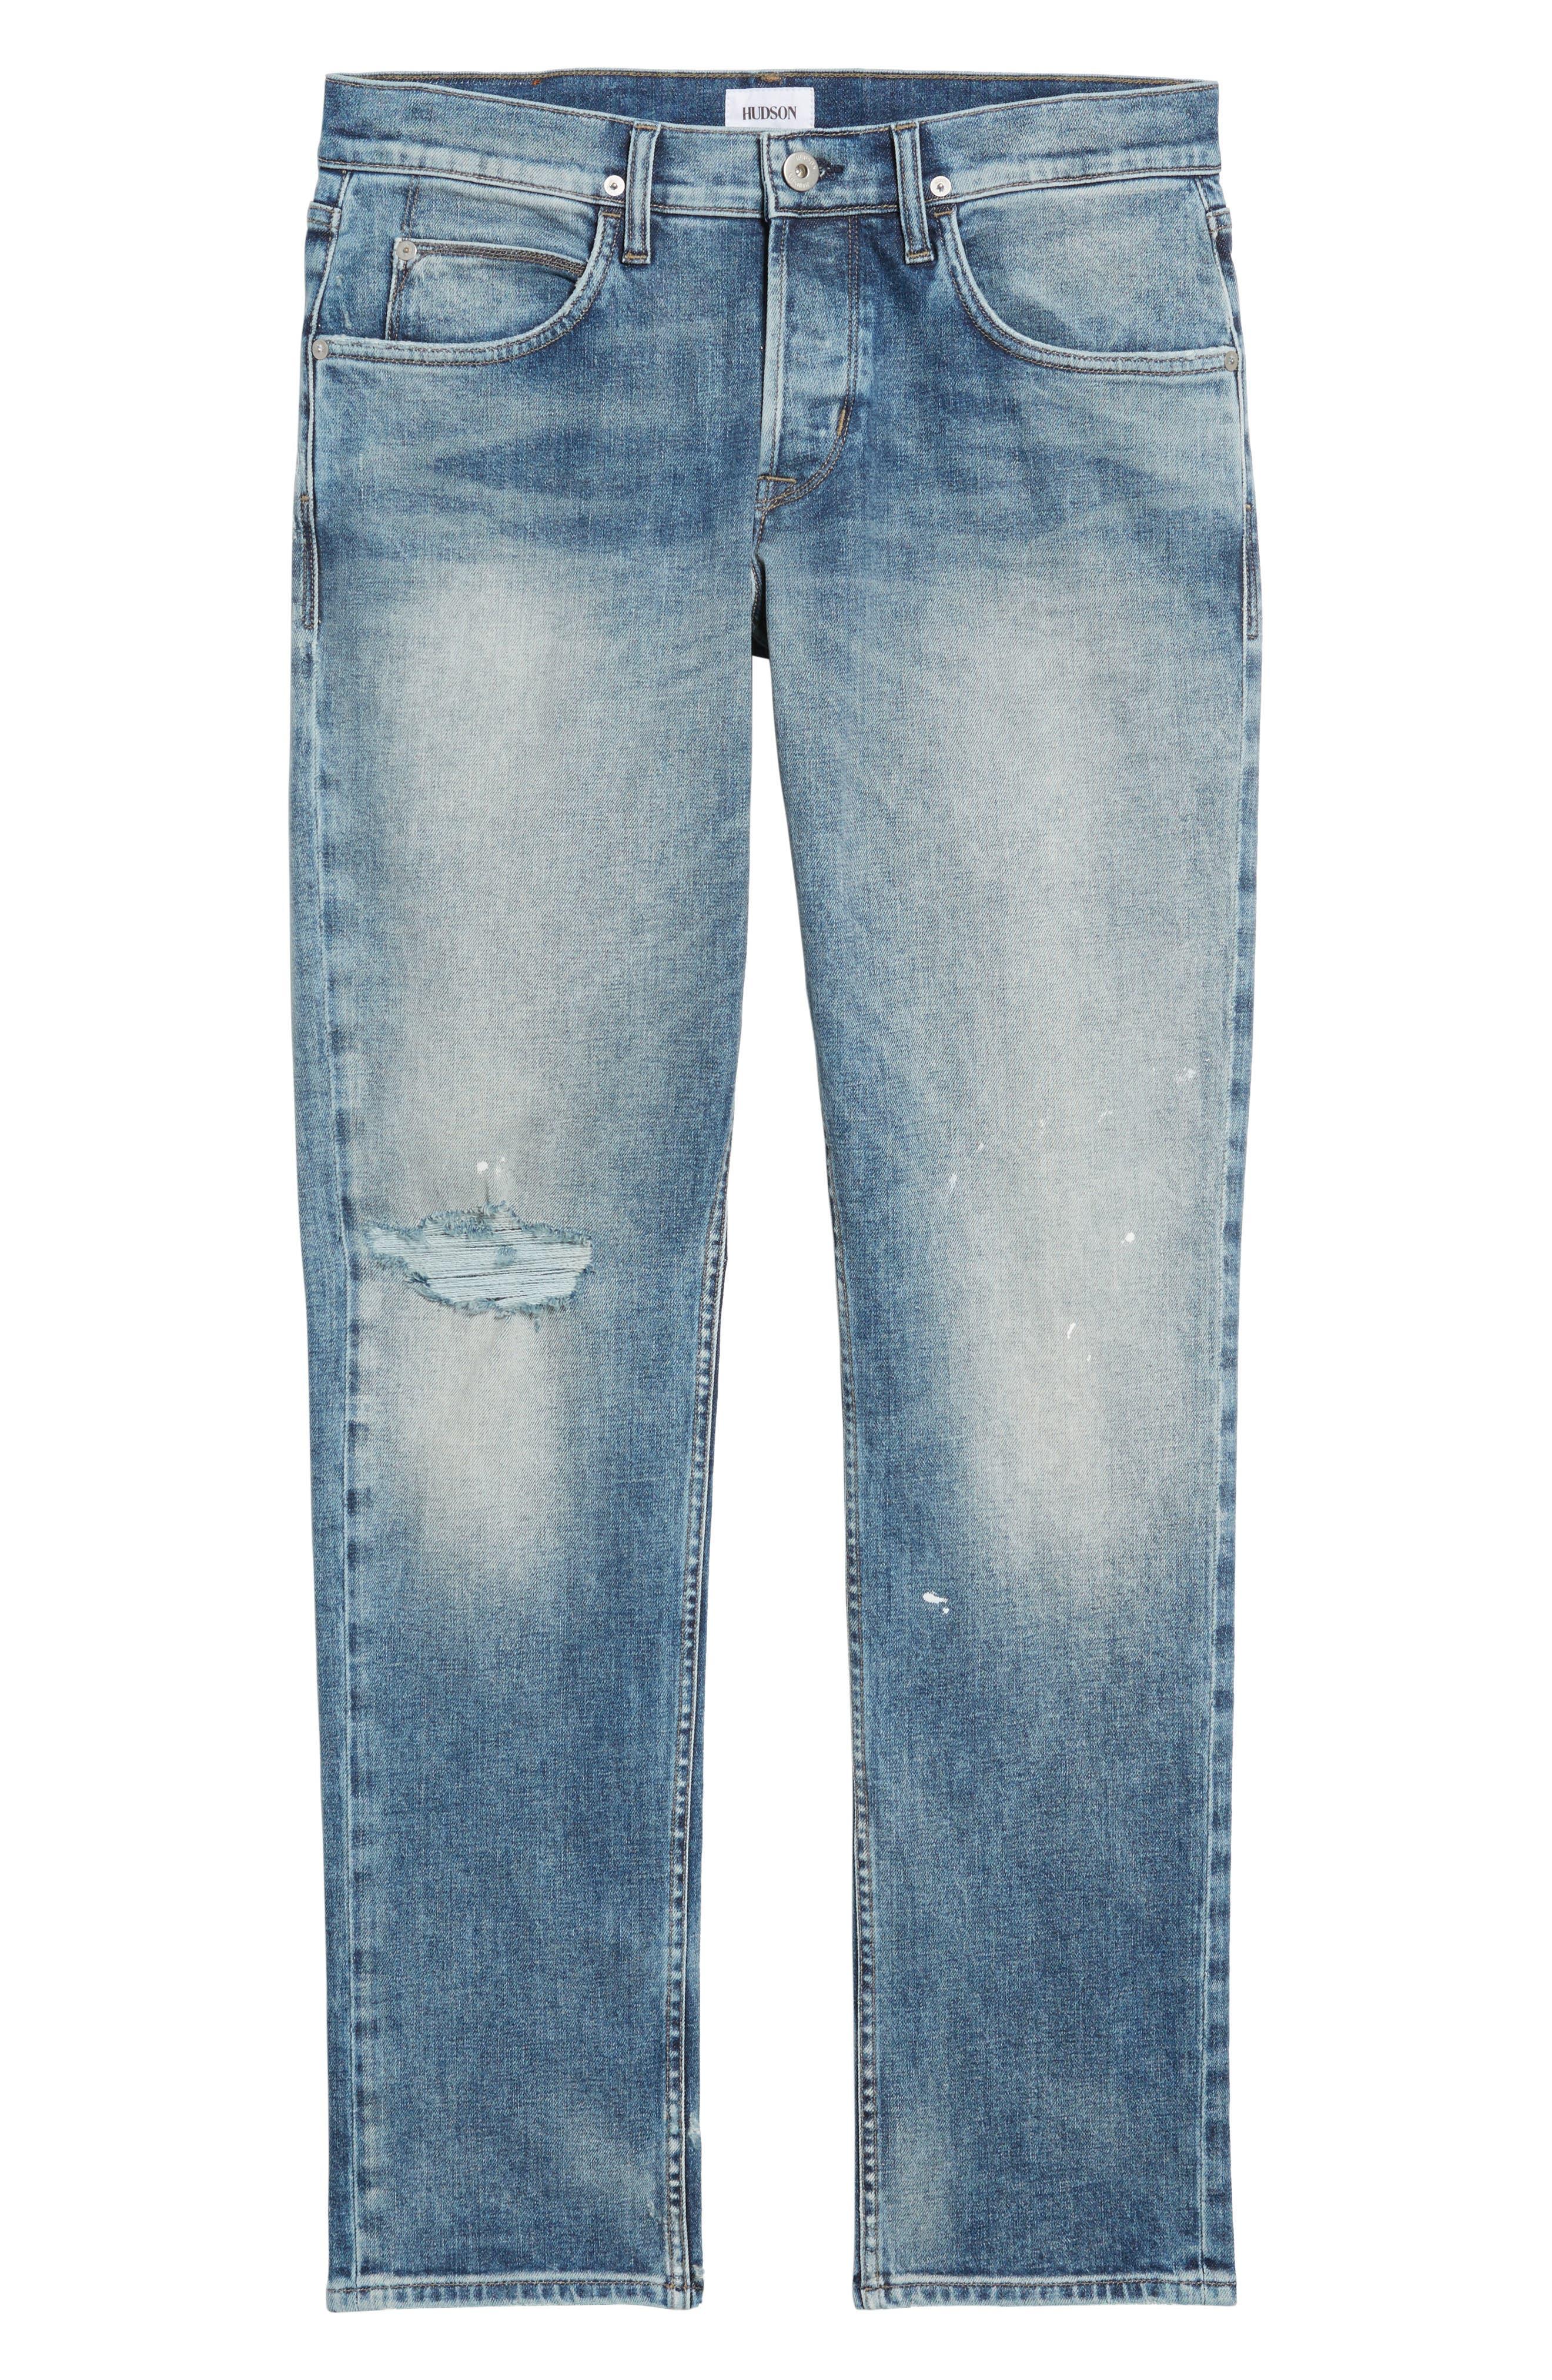 Blake Slim Fit Jeans,                             Alternate thumbnail 6, color,                             451